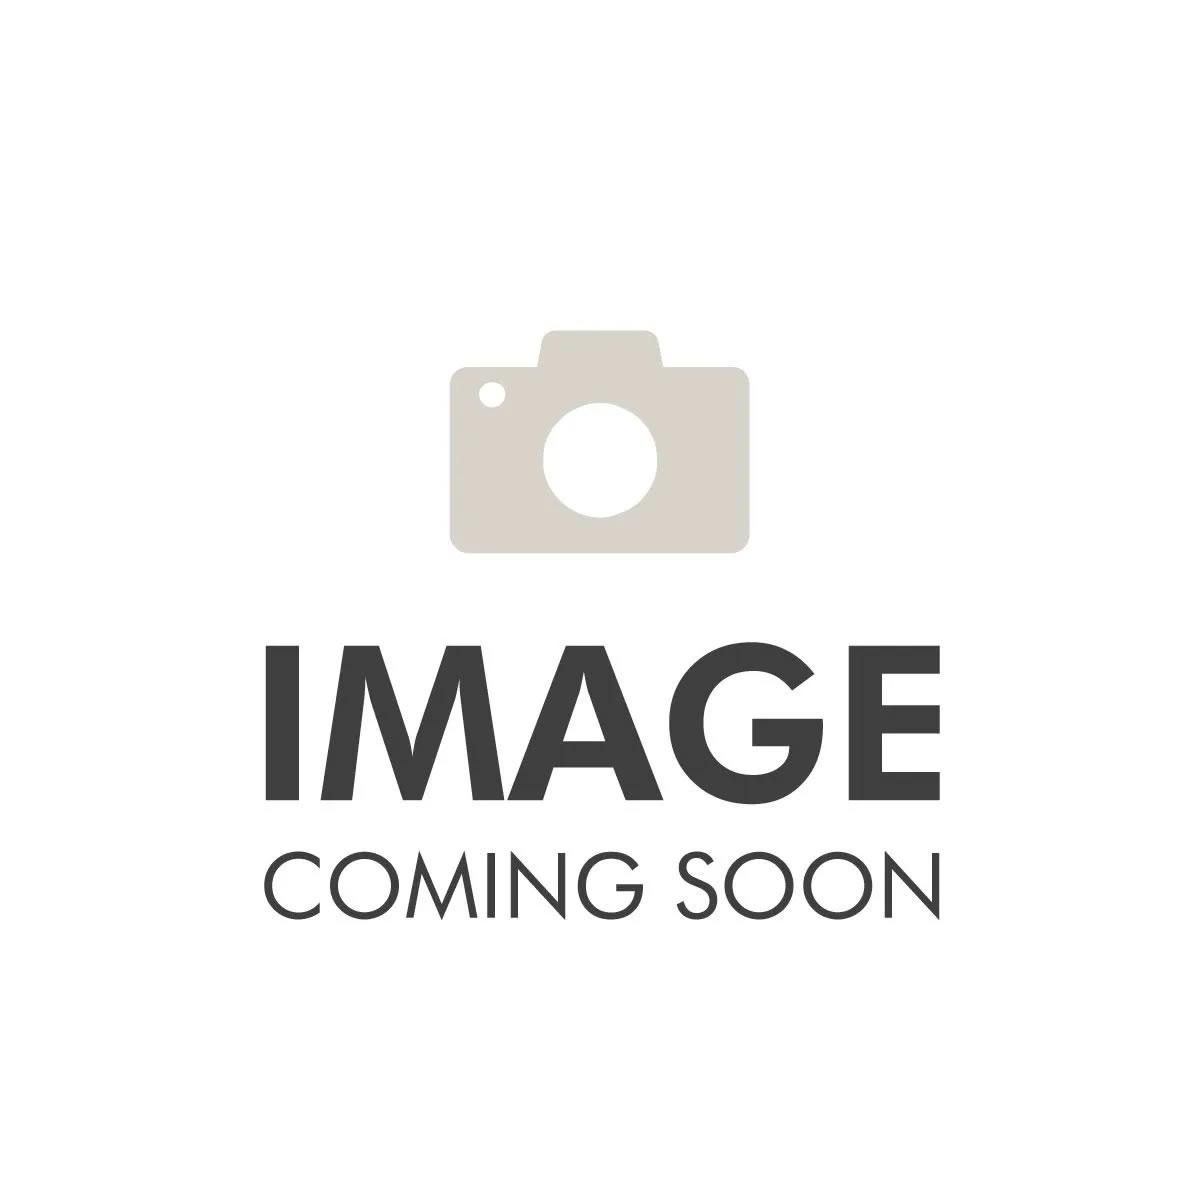 Receiver Hitch Kit With Jeep Plug 2007-2012 JK